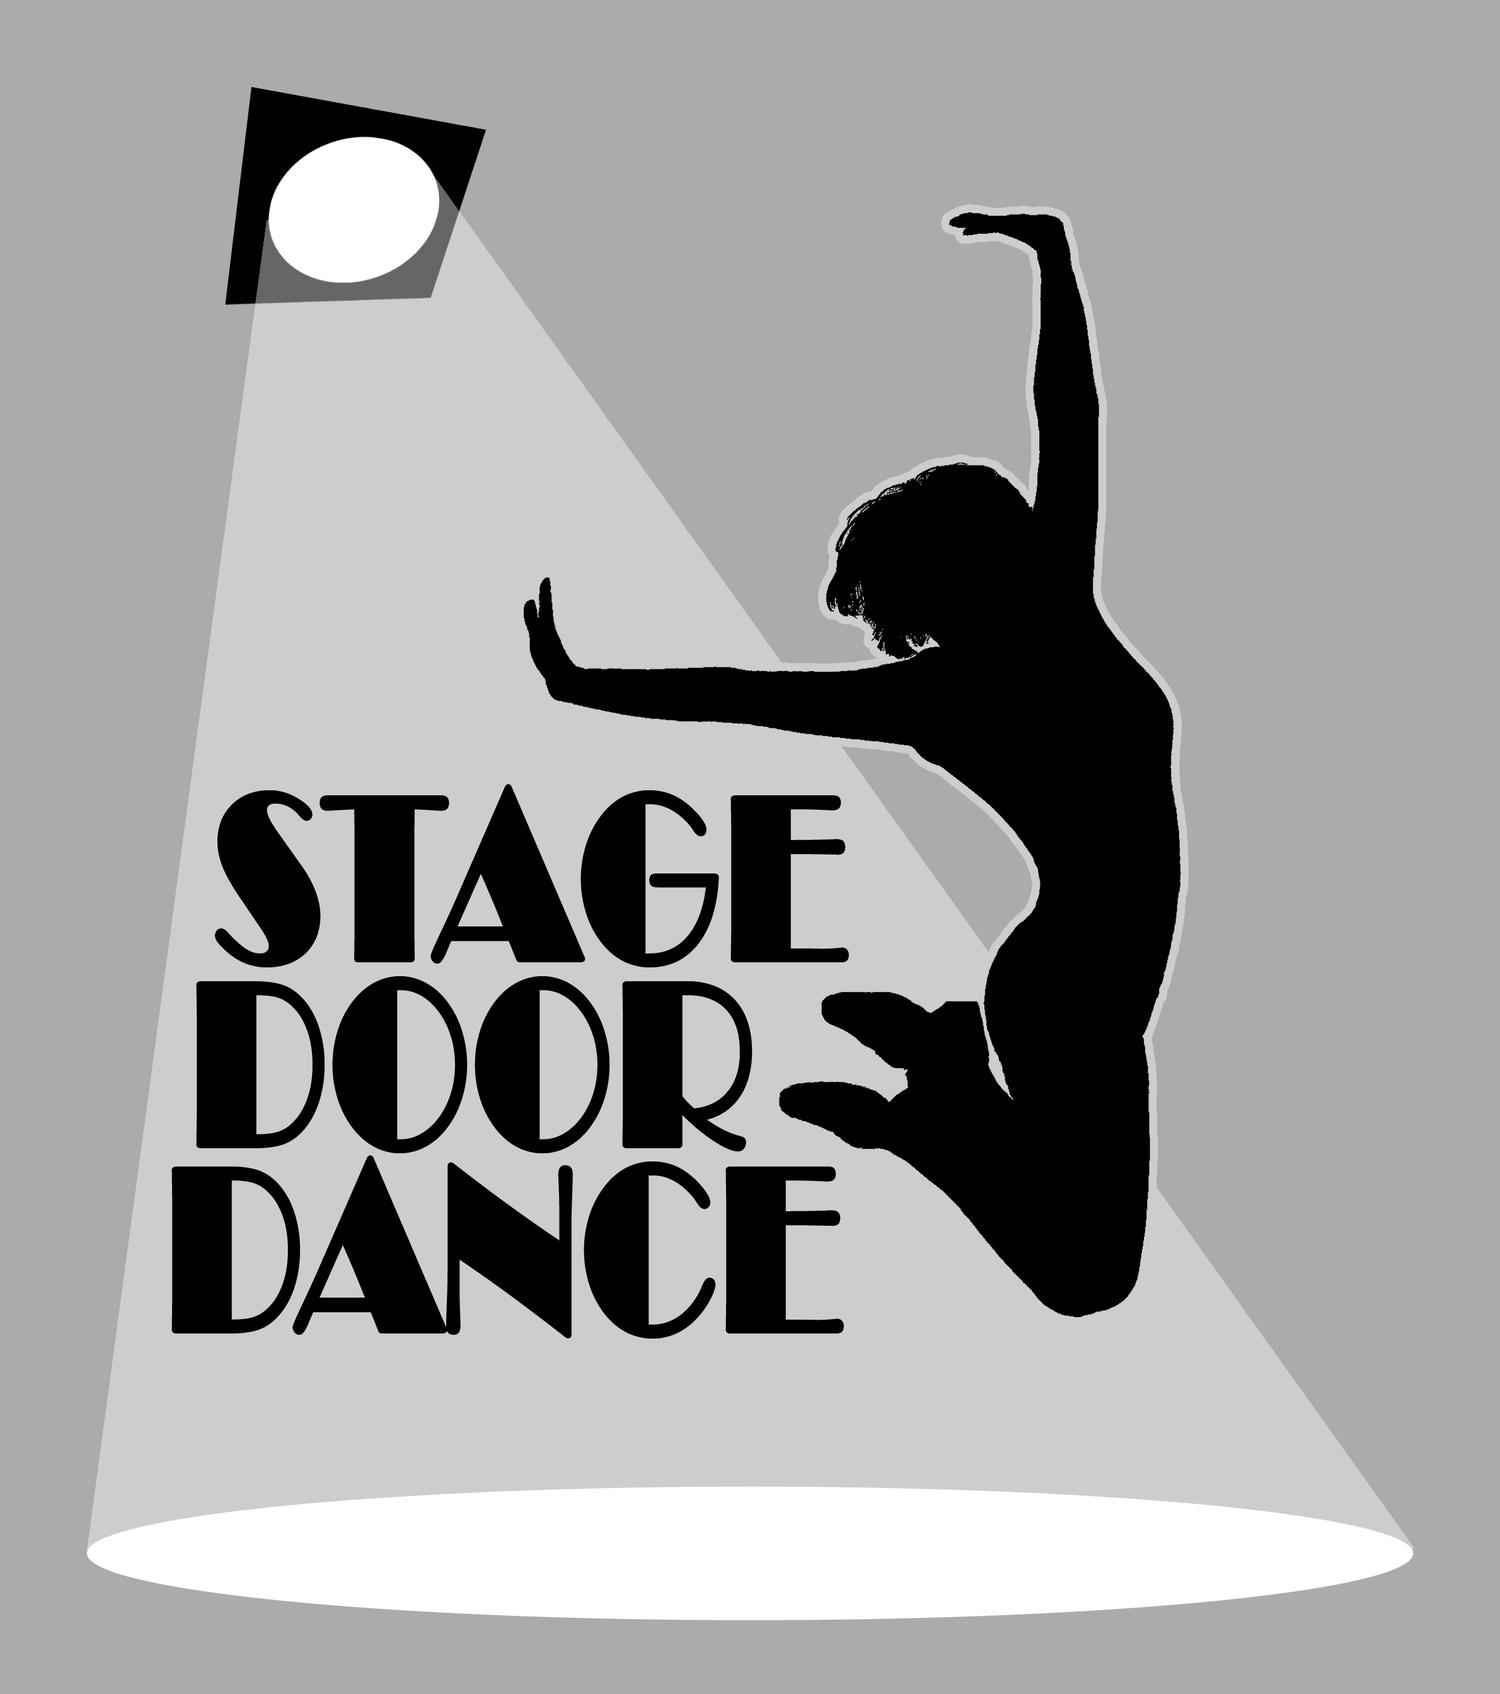 Chasta Calhoun's Stage Door Dance Production & TutuTix Series